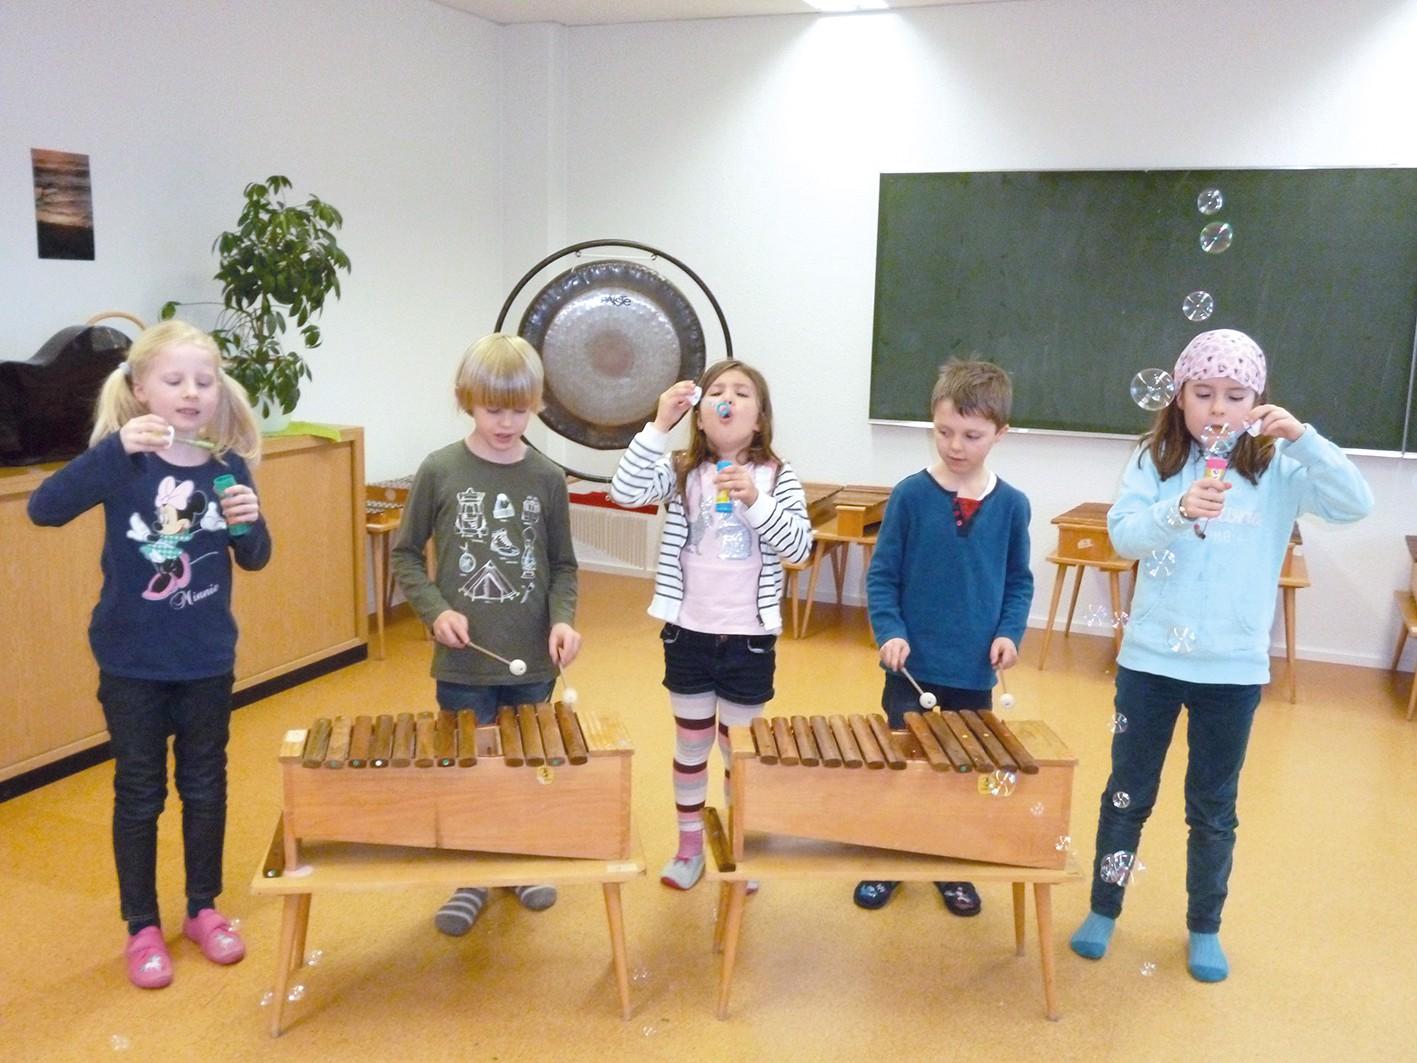 Rosmarie-Theobald-Musikschule Ottobrunn GmbH